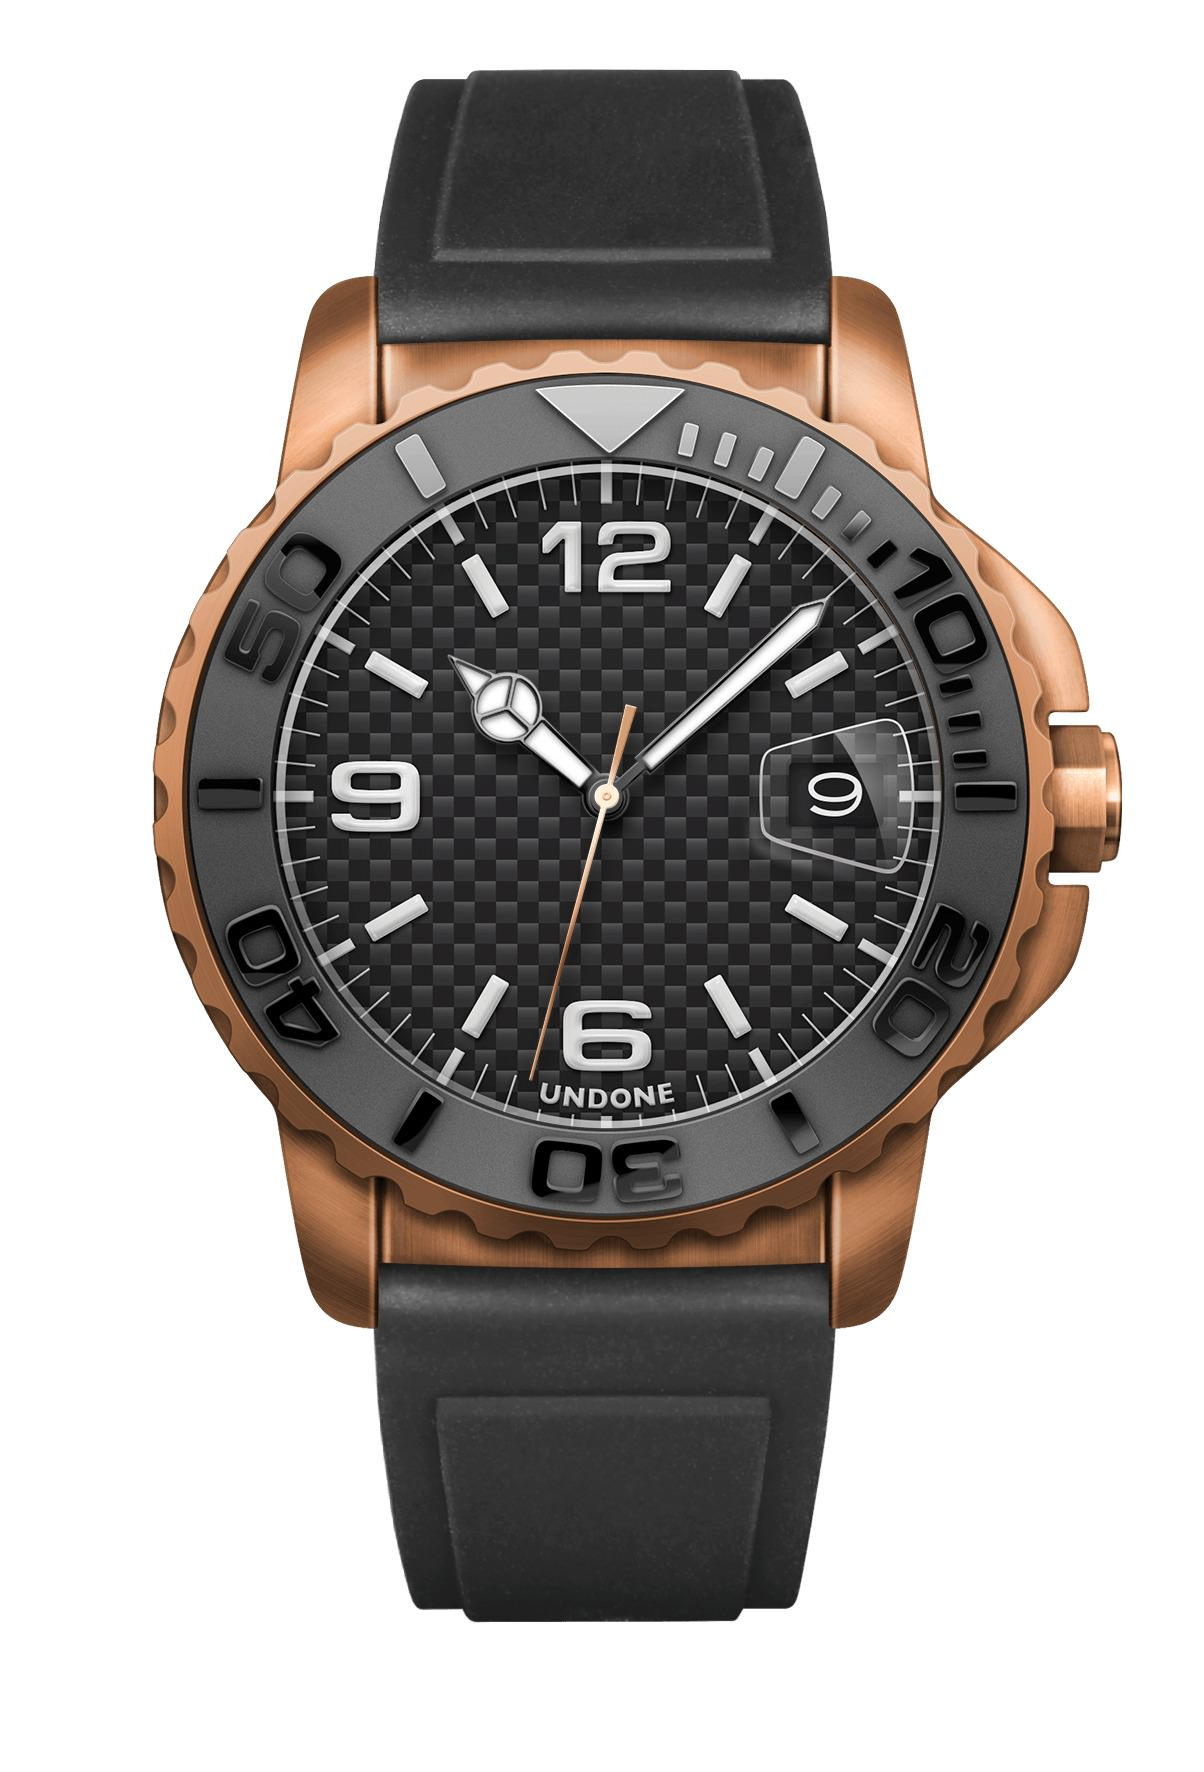 undone black brown color watch